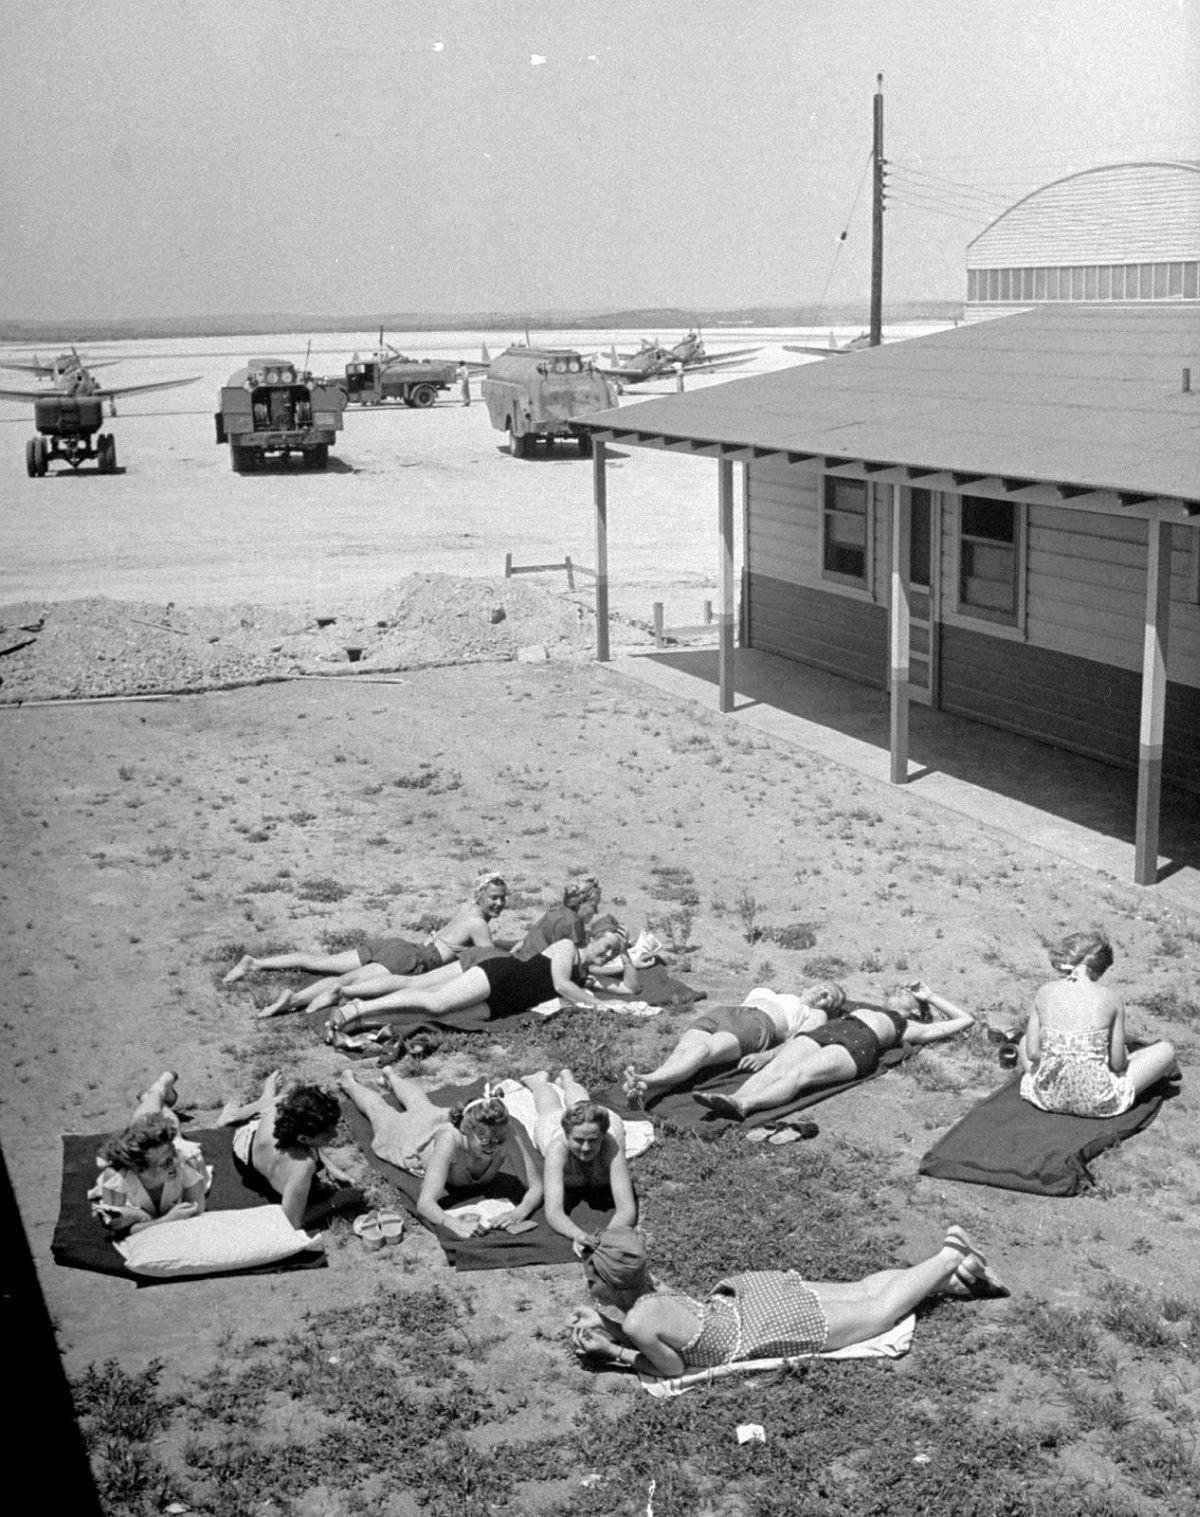 A Sunday sunbath for Avenger pilots.